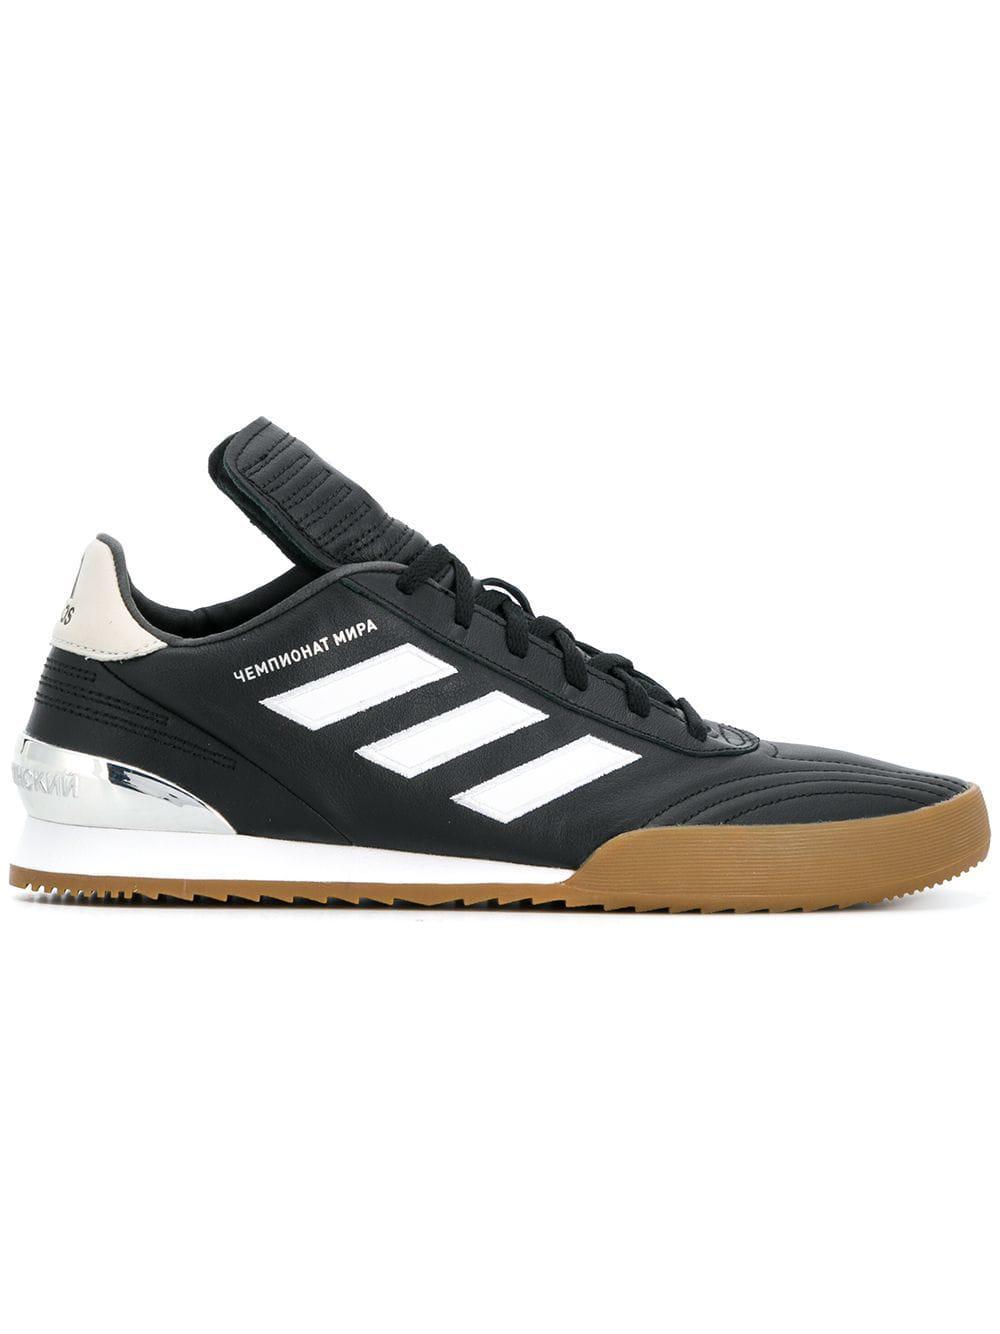 92b352e5b463 Gosha Rubchinskiy Adidas Copa Sneaker in Black for Men - Save 79% - Lyst